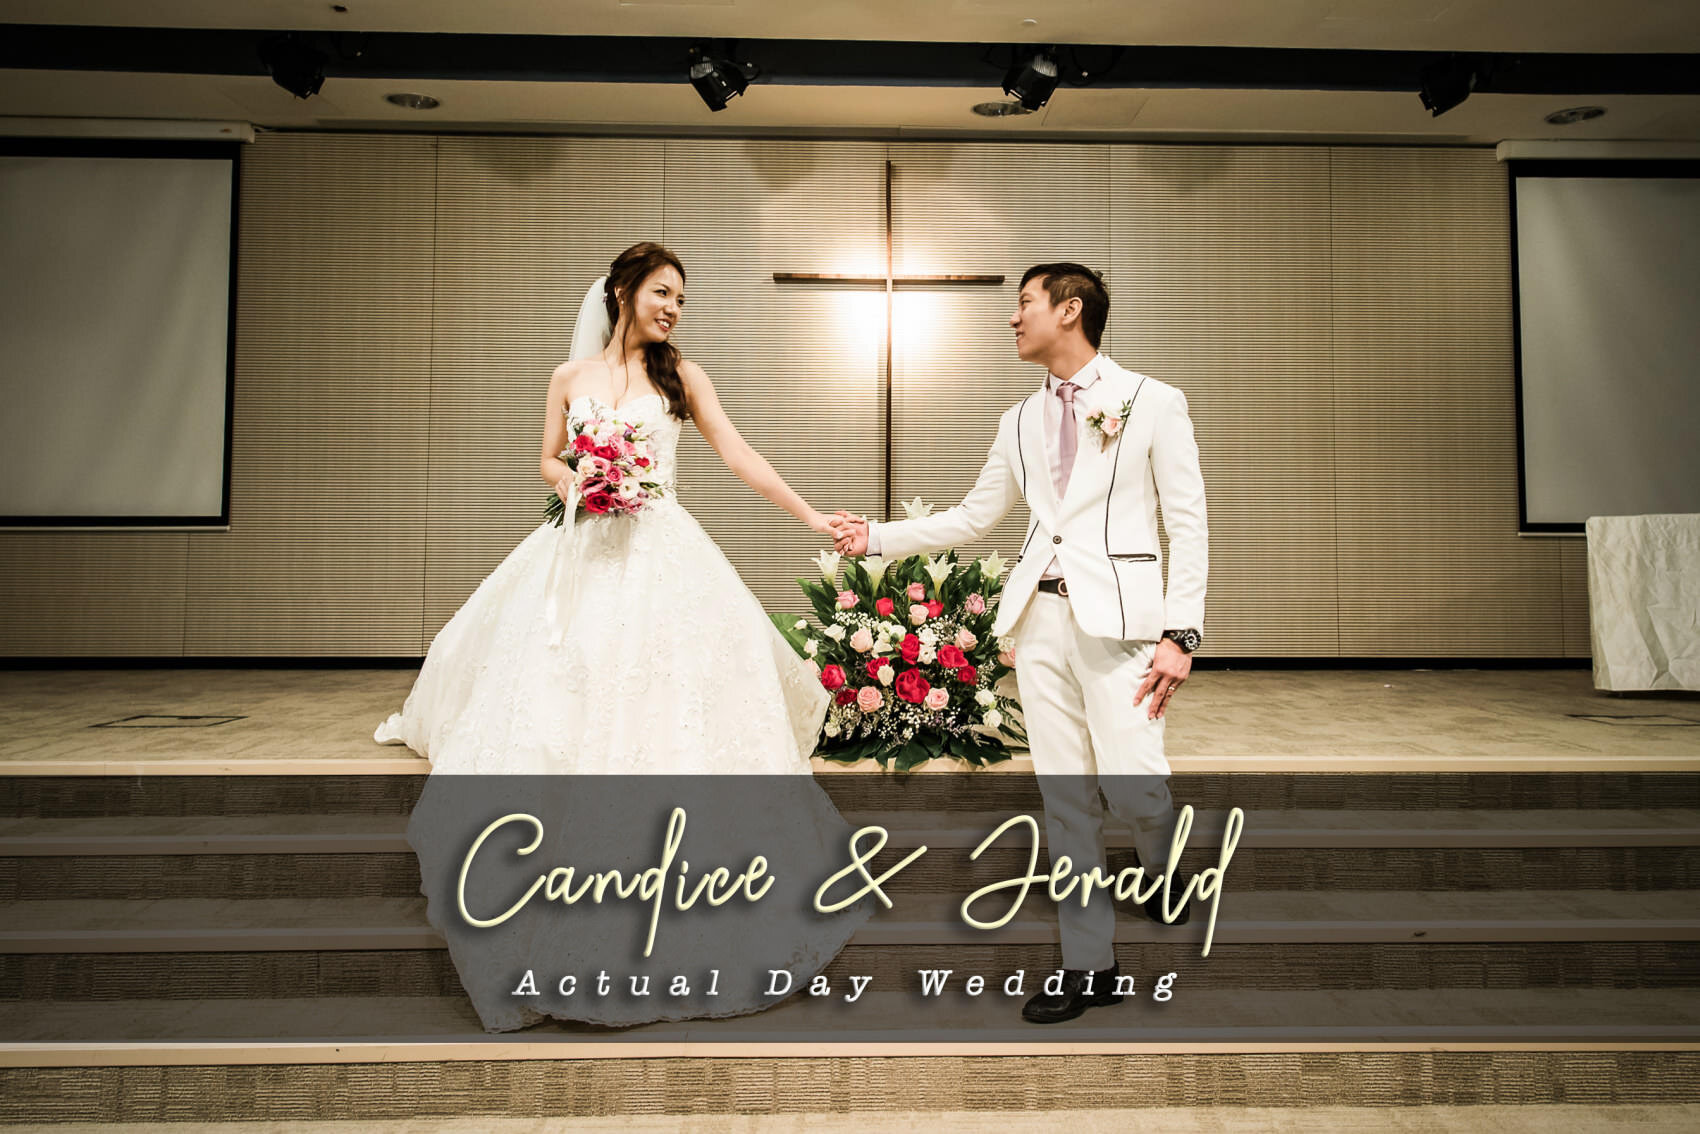 Singapore Church wedding photography & Joyden Hall banquet